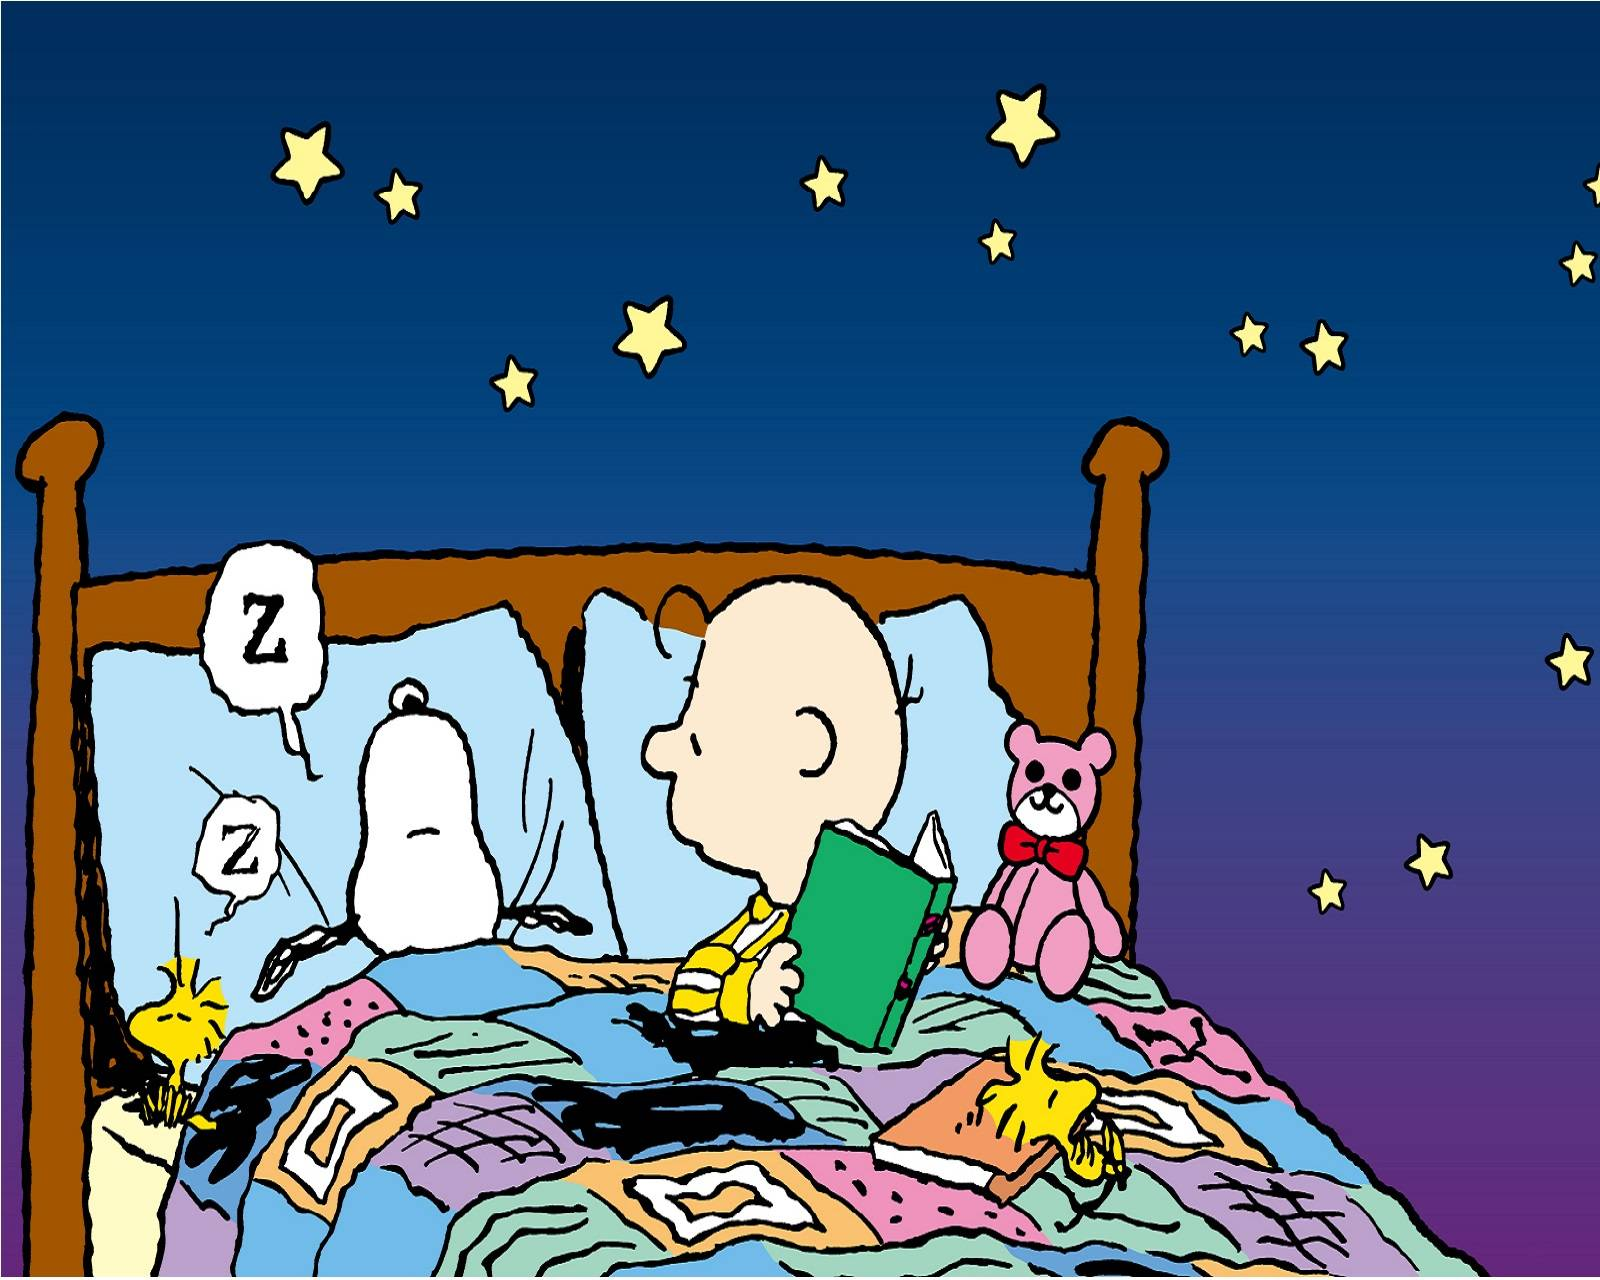 Snoozy Snoopy